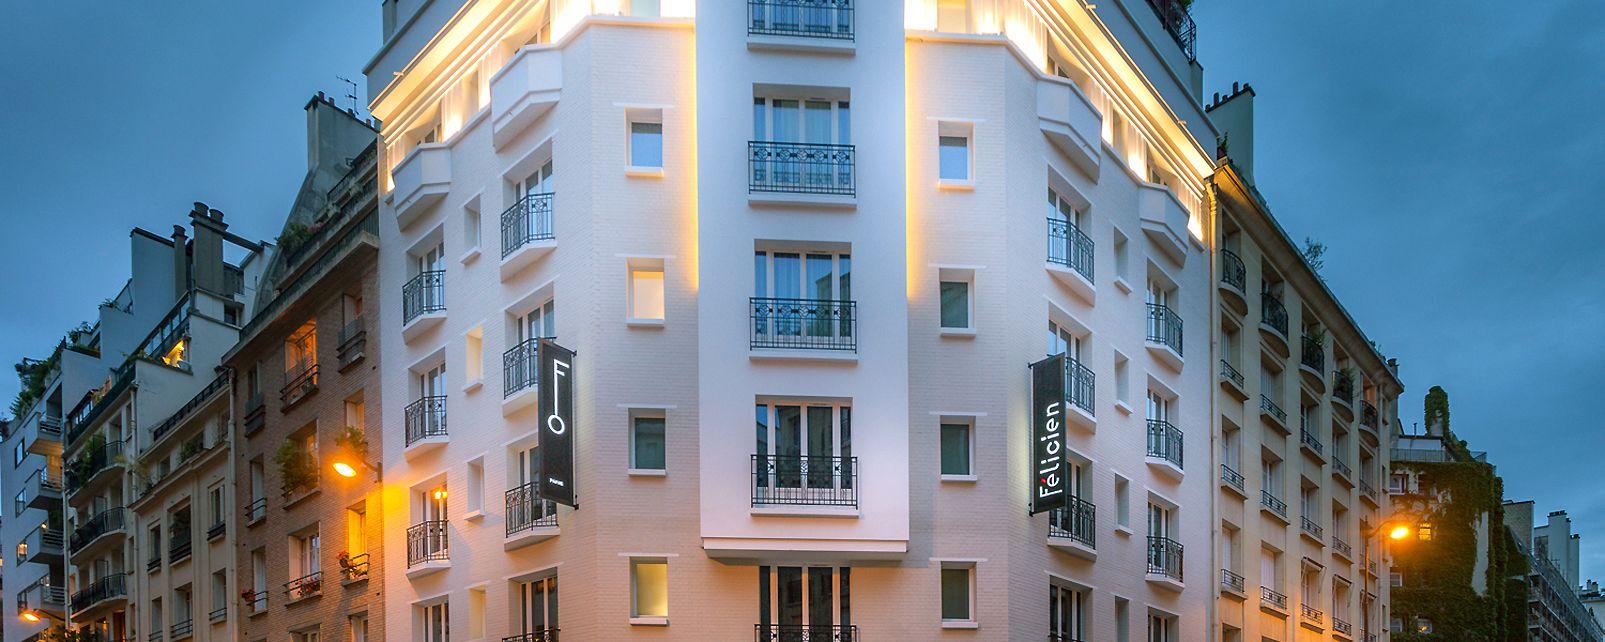 Hôtel Félicien